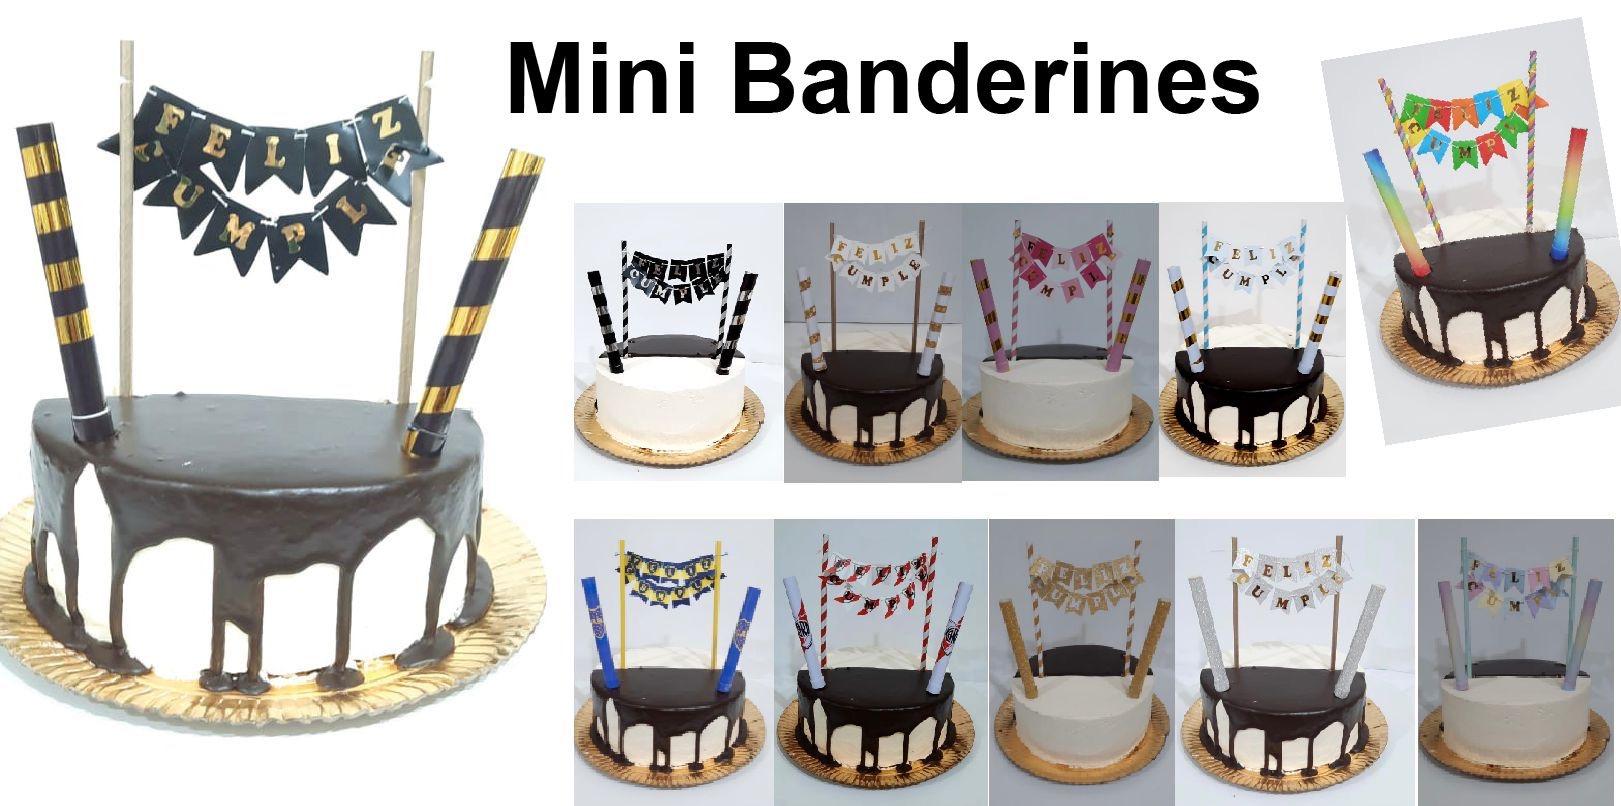 MINI BANDERINES